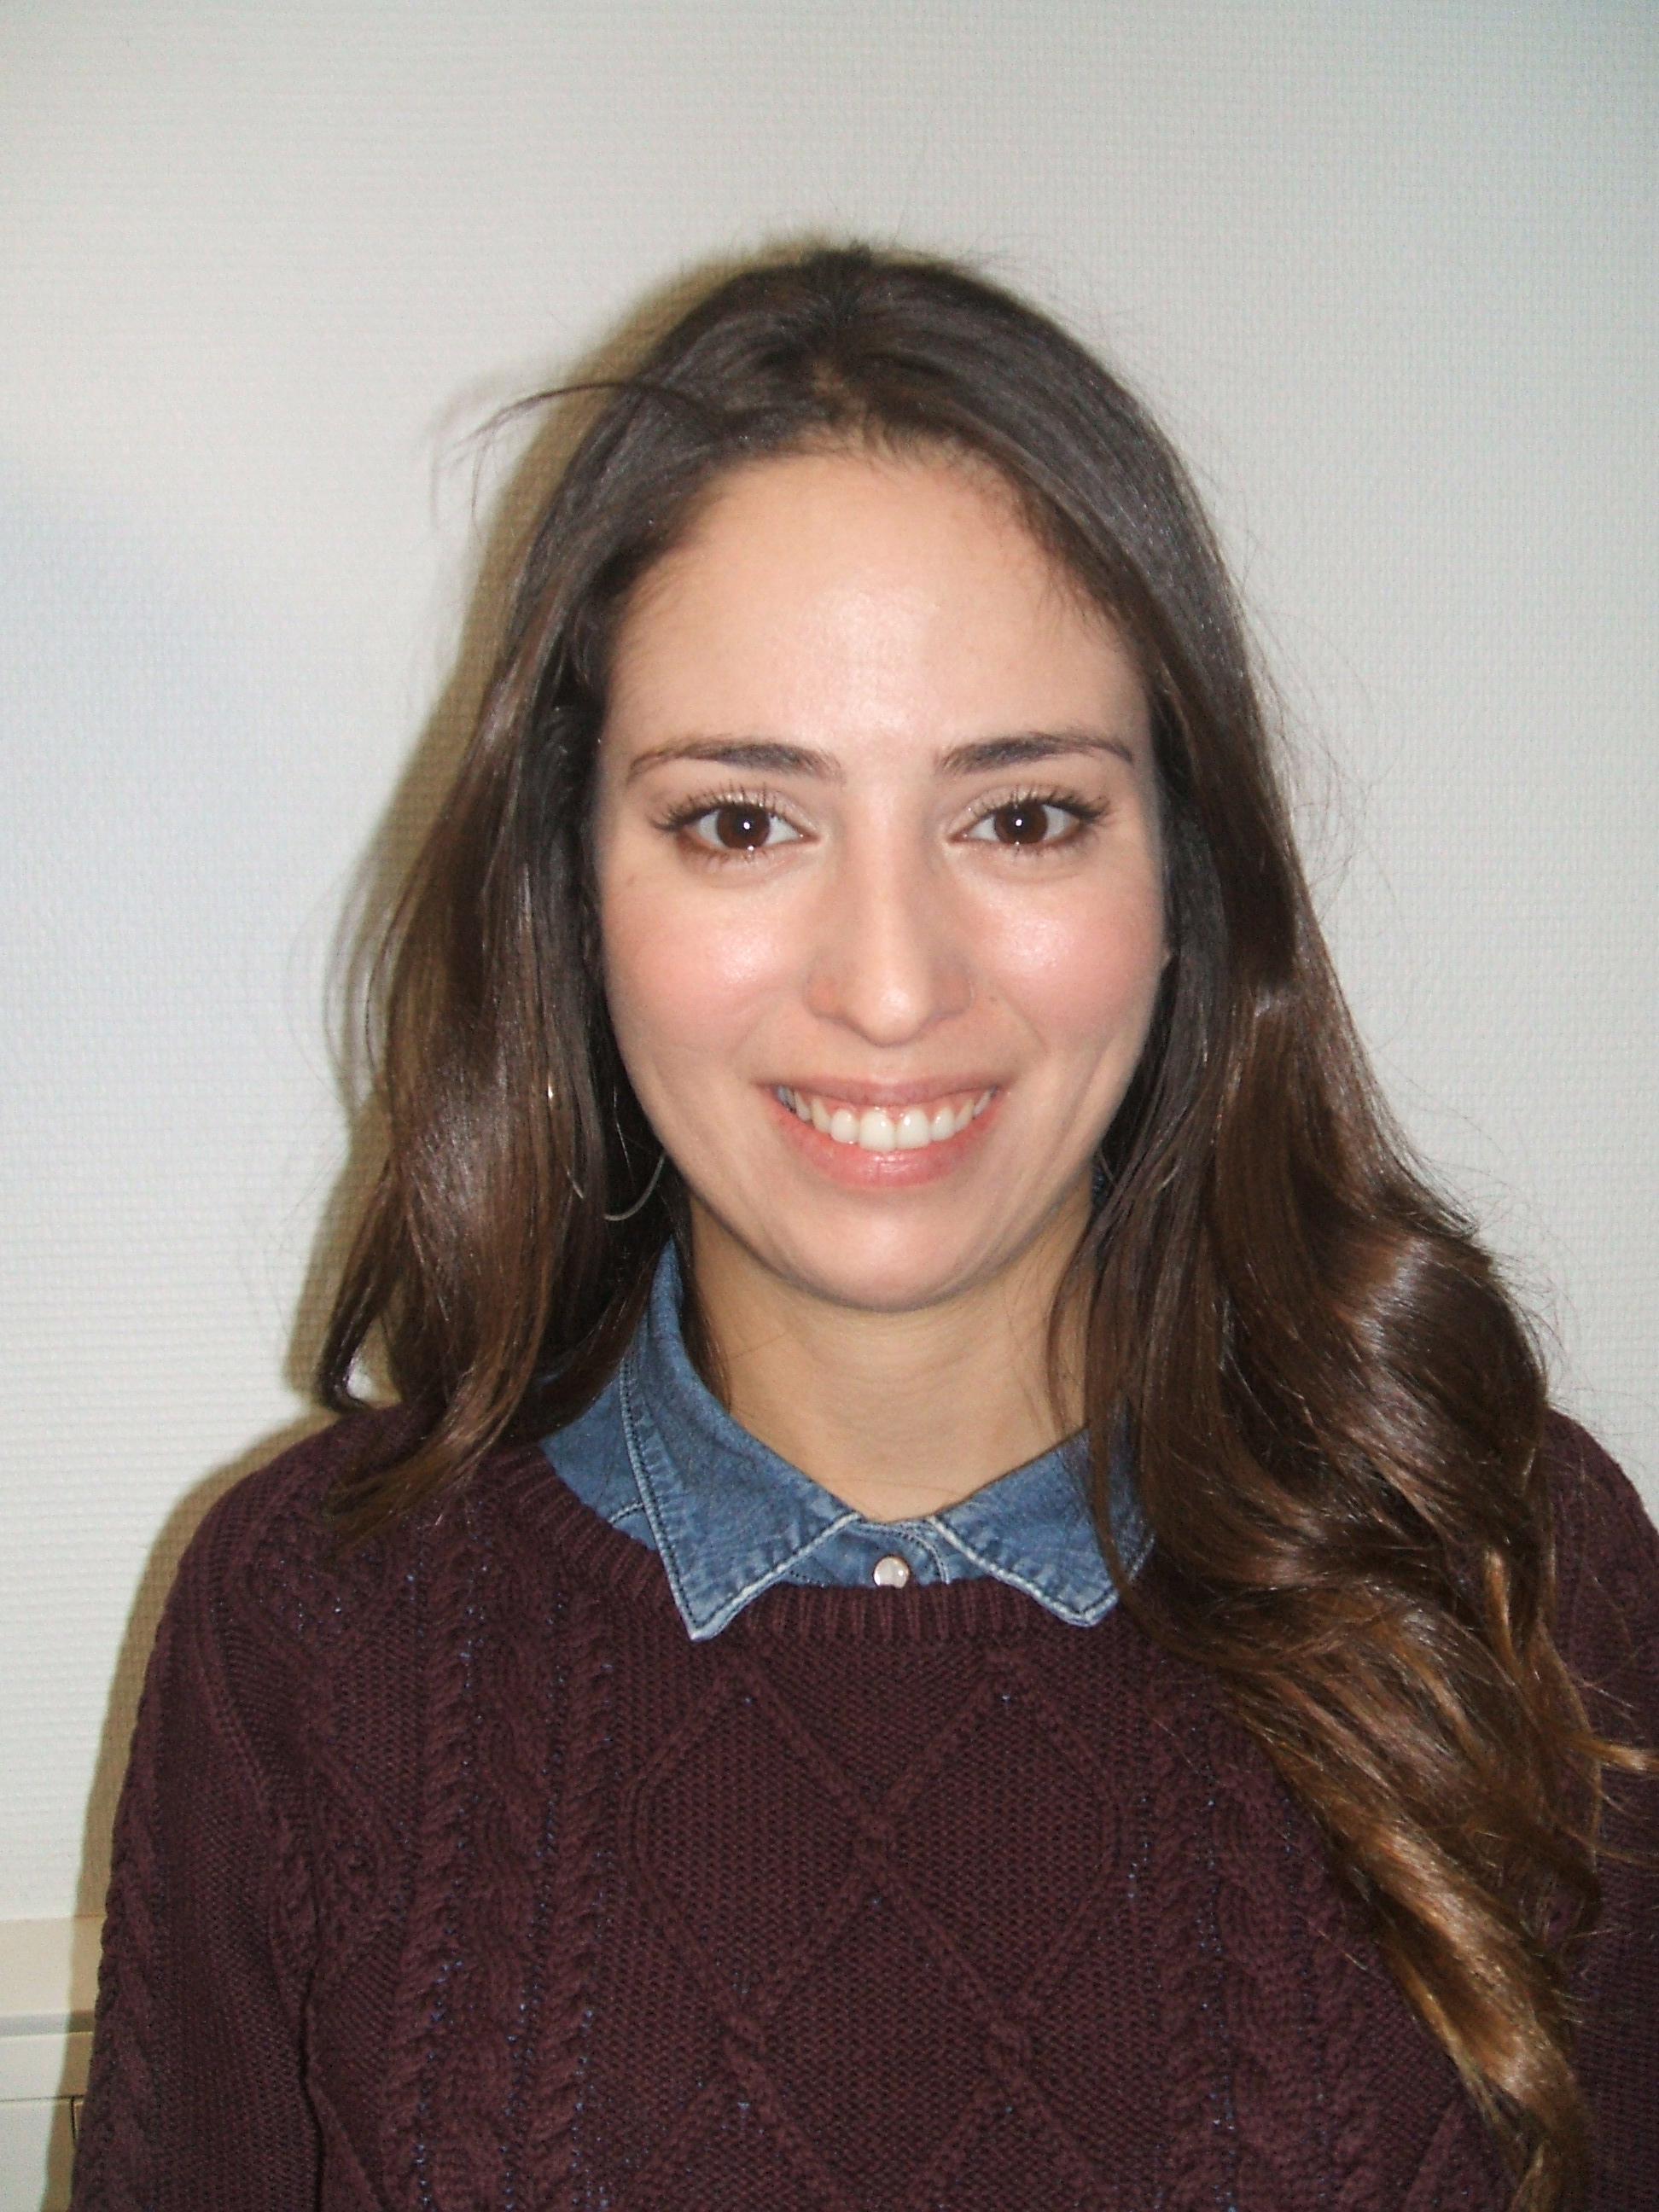 Picture of Alissa Bouzeggane